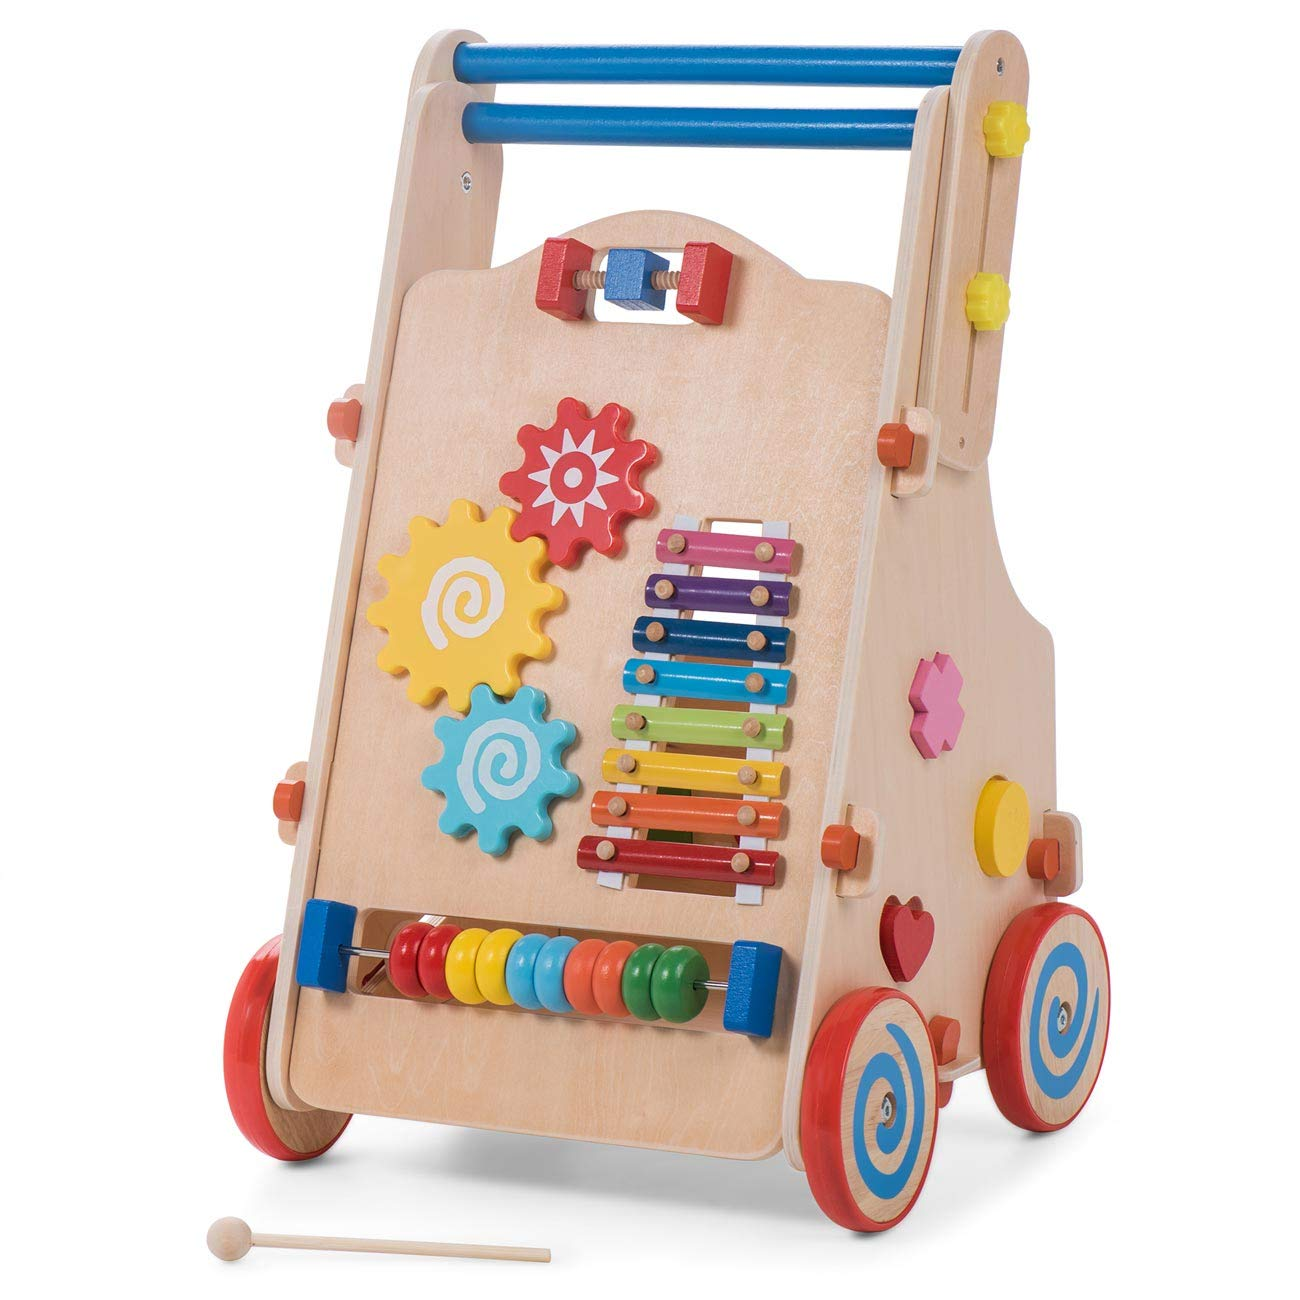 Baby Vivo Baby Walker First Steps Children Kids Push Along Toy Training Walker Multifunctional Made of Wood - Carla